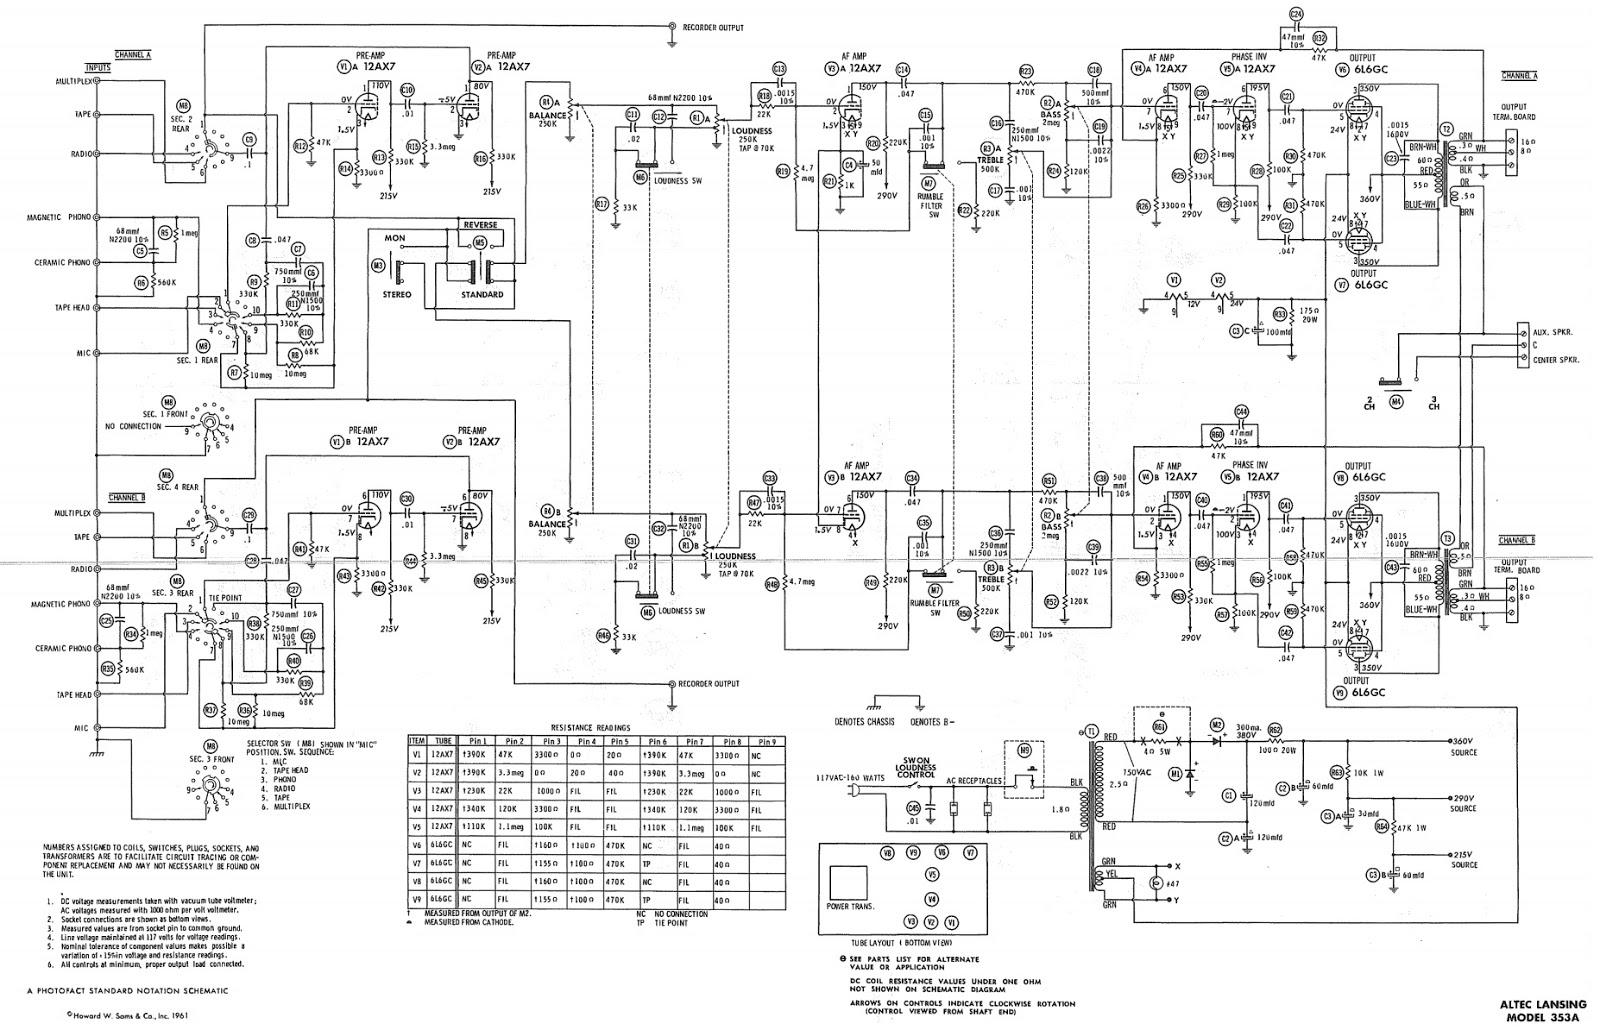 medium resolution of altec ta60 wiring diagram schematics wiring diagrams u2022 rh parntesis co altec bucket covers altec bucket